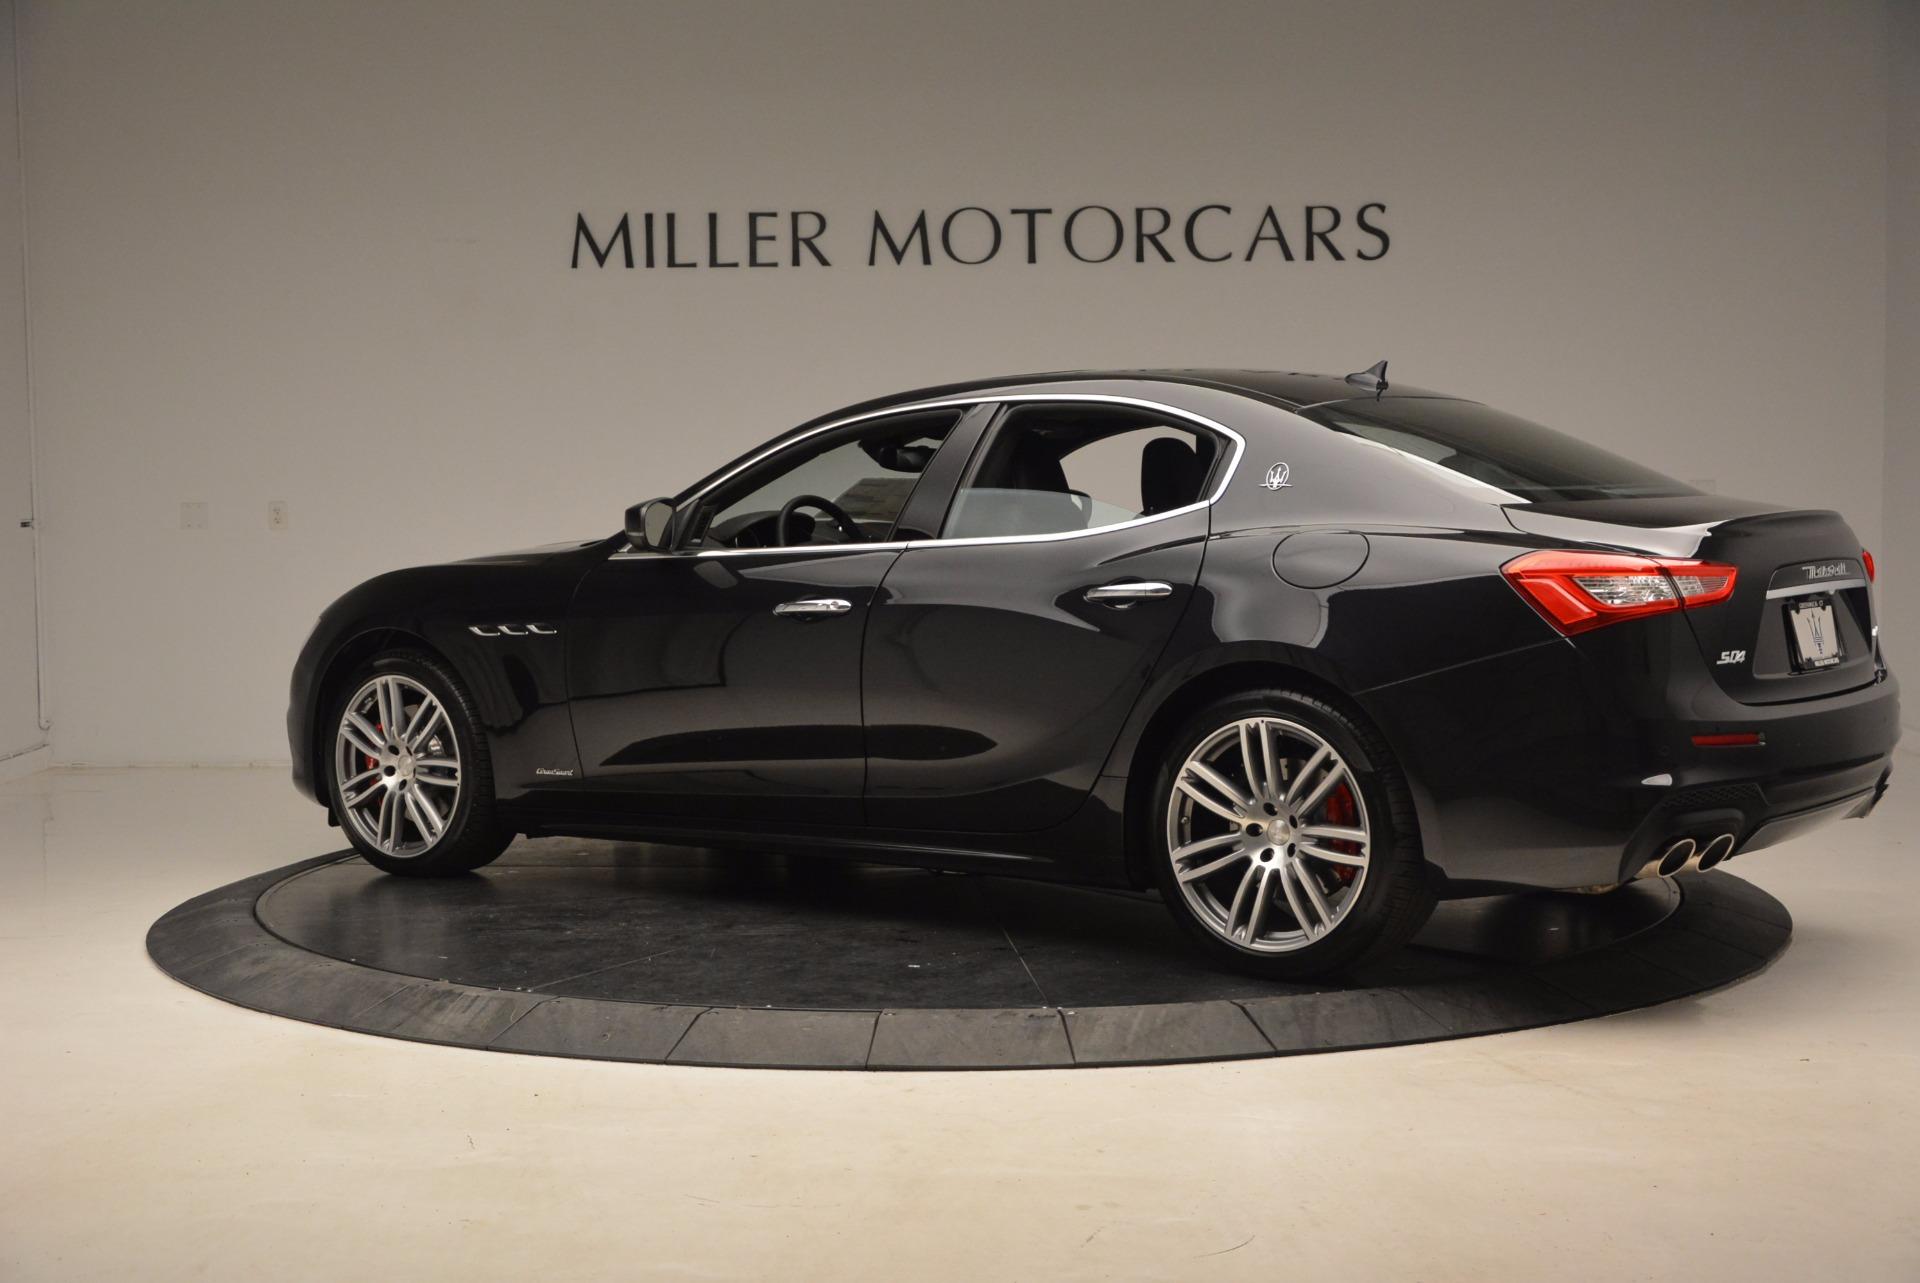 New 2018 Maserati Ghibli S Q4 GranSport For Sale In Greenwich, CT 1569_p4